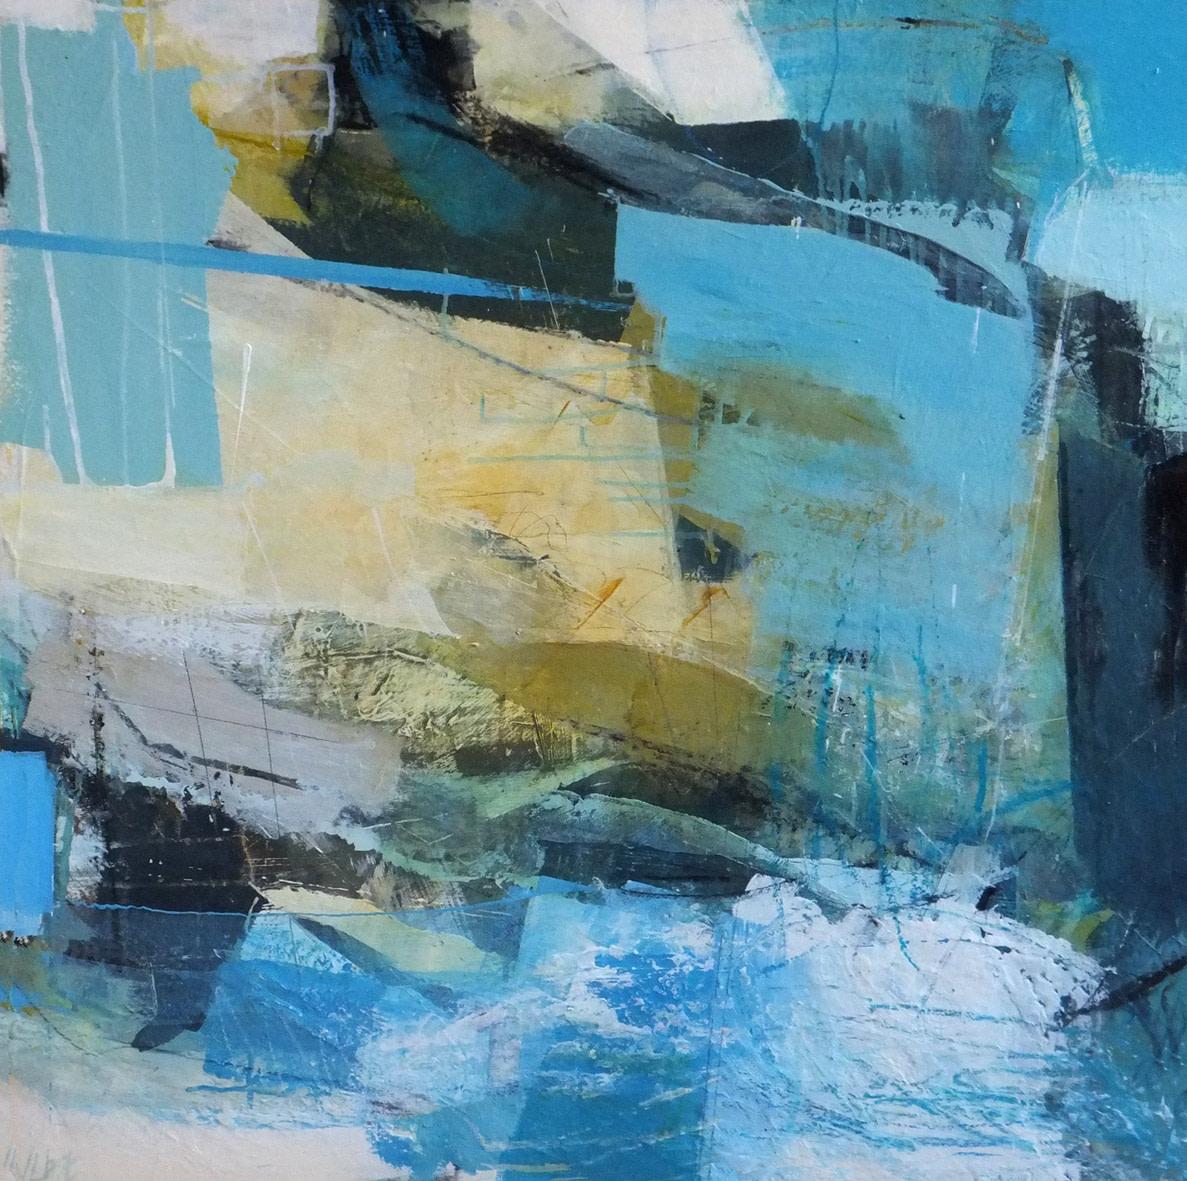 "<span class=""link fancybox-details-link""><a href=""/artists/66-joanne-last/works/6983-joanne-last-coastal-elements-2020/"">View Detail Page</a></span><div class=""artist""><strong>Joanne Last</strong></div> <div class=""title""><em>Coastal Elements</em>, 2020</div> <div class=""signed_and_dated"">signed on back</div> <div class=""medium"">Acrylic on board</div> <div class=""dimensions"">h. 84 x w. 84 cm </div><div class=""price"">£1,700.00</div><div class=""copyright_line"">Ownart: £170 x 10 Months, 0% APR</div>"